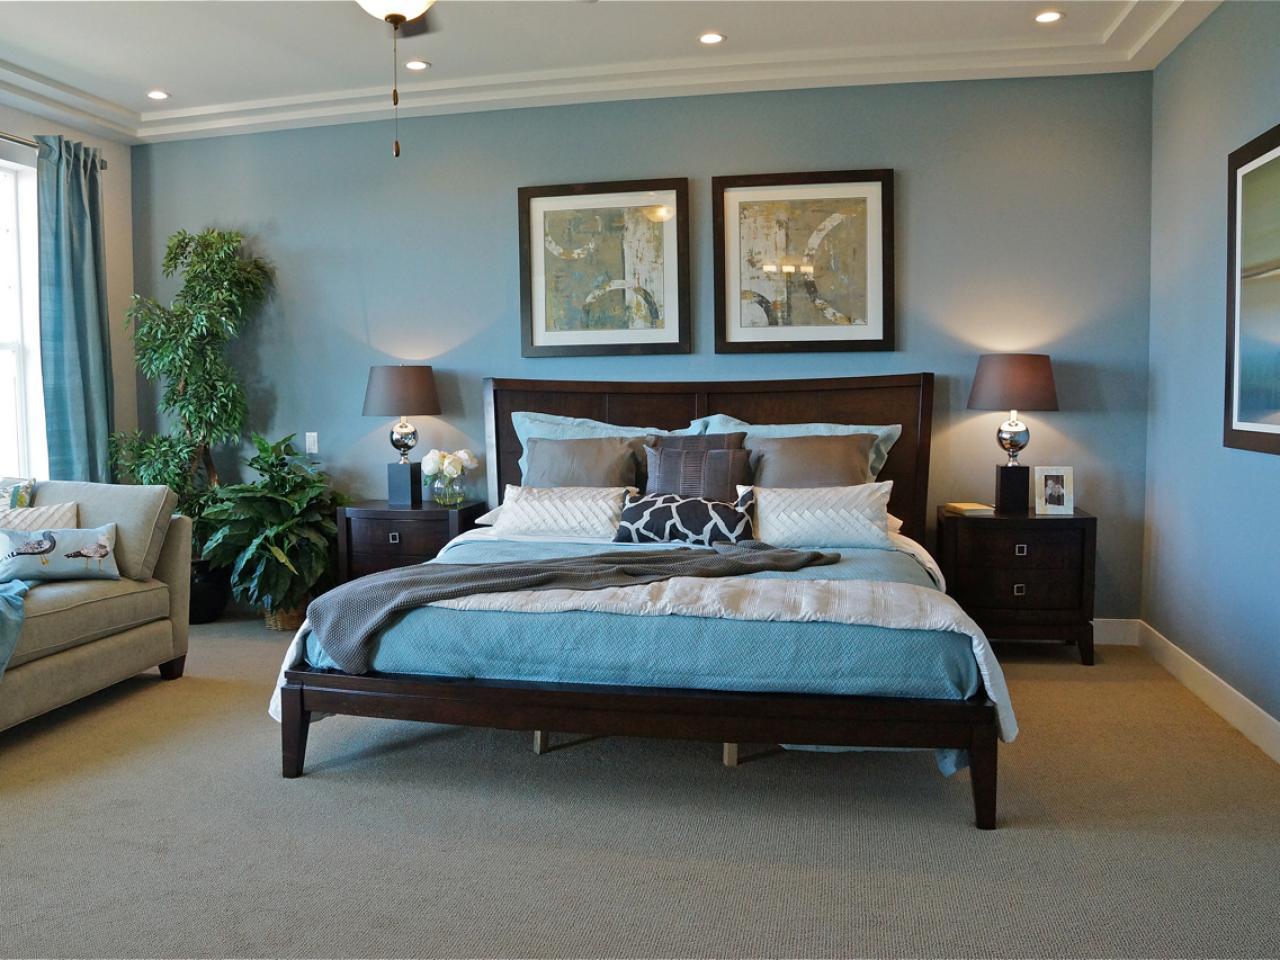 Blue Traditional Bedrooms 21 Decor Ideas  EnhancedHomesorg